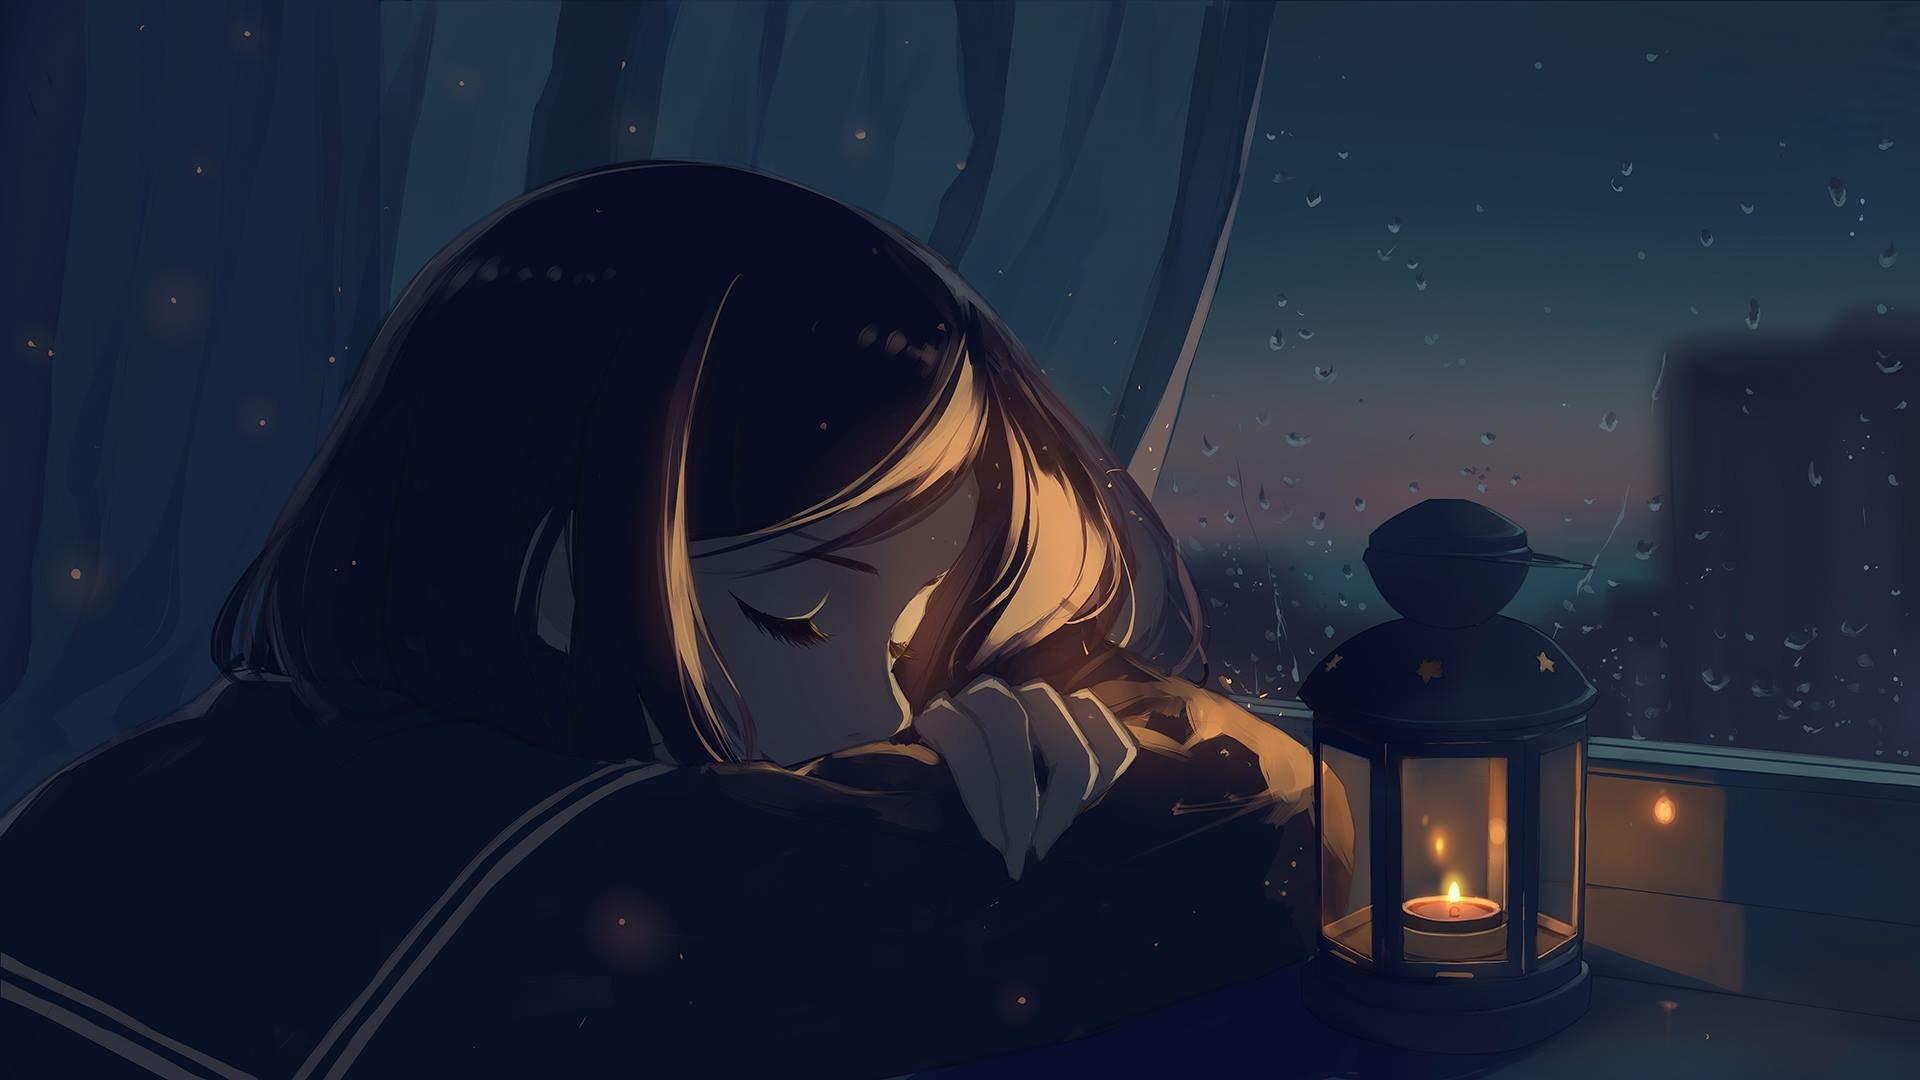 Anime 1920x1080 closed eyes sleeping window night